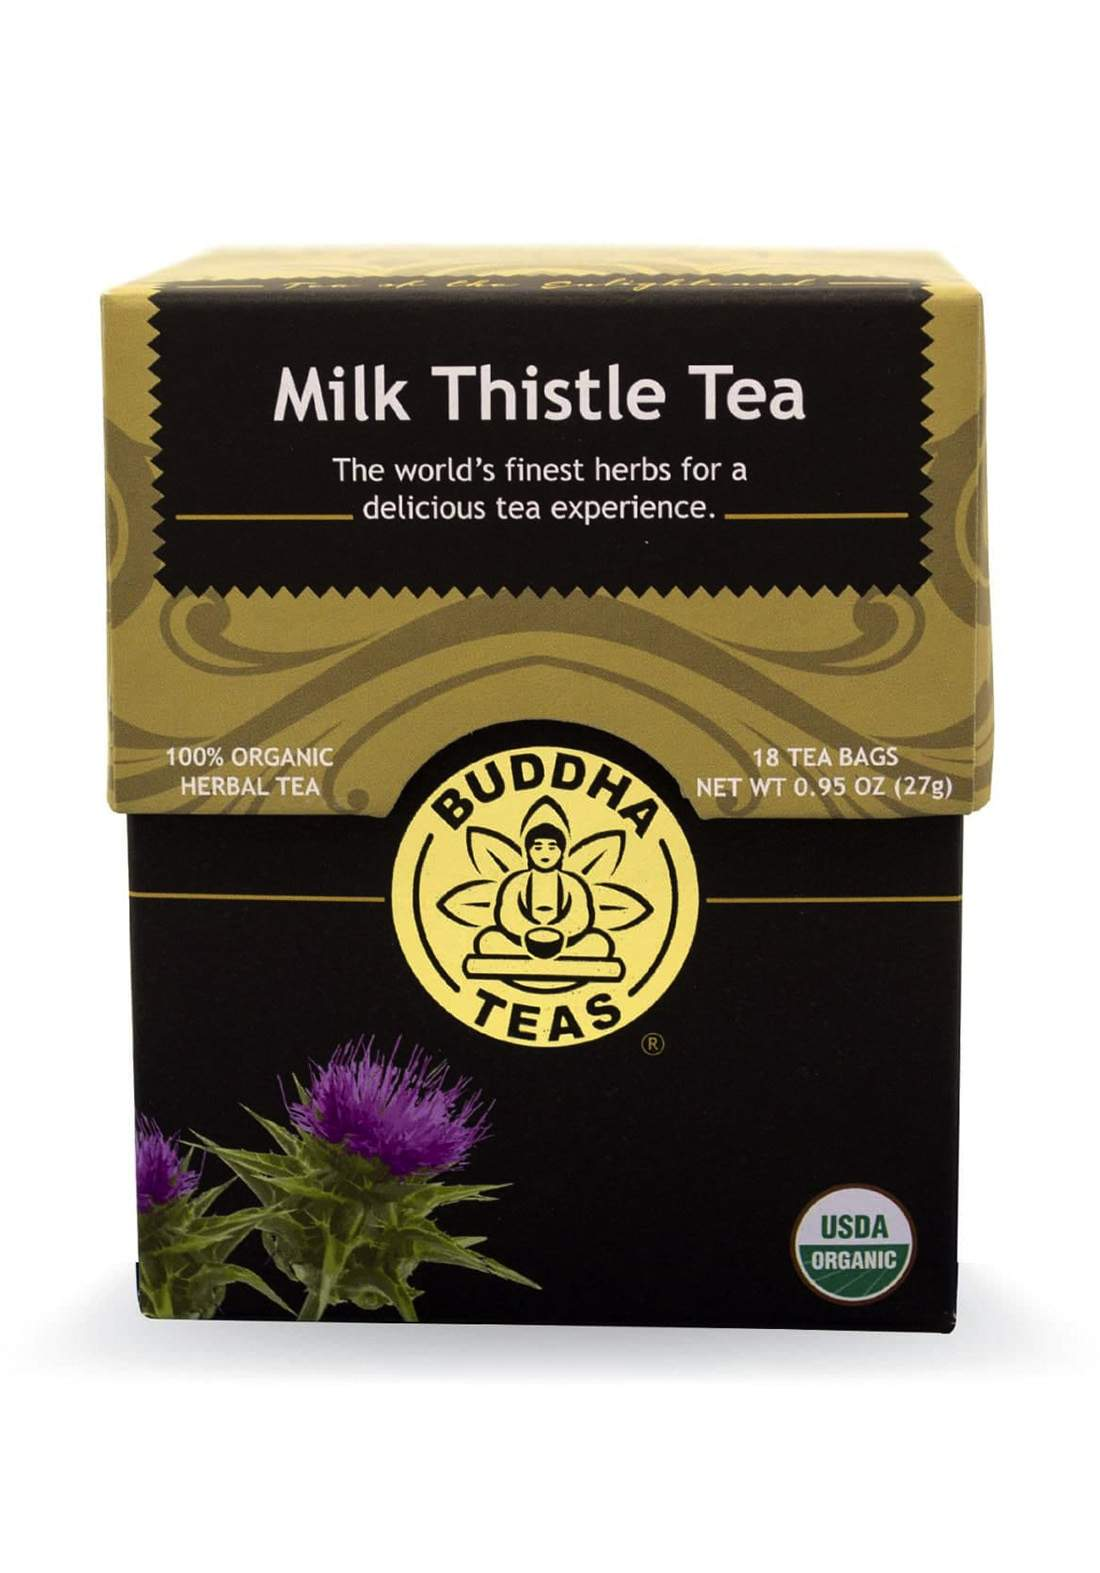 Buddha Organic Milk Thistle Tea 18 tea bags 27g شاي شوك الجمل